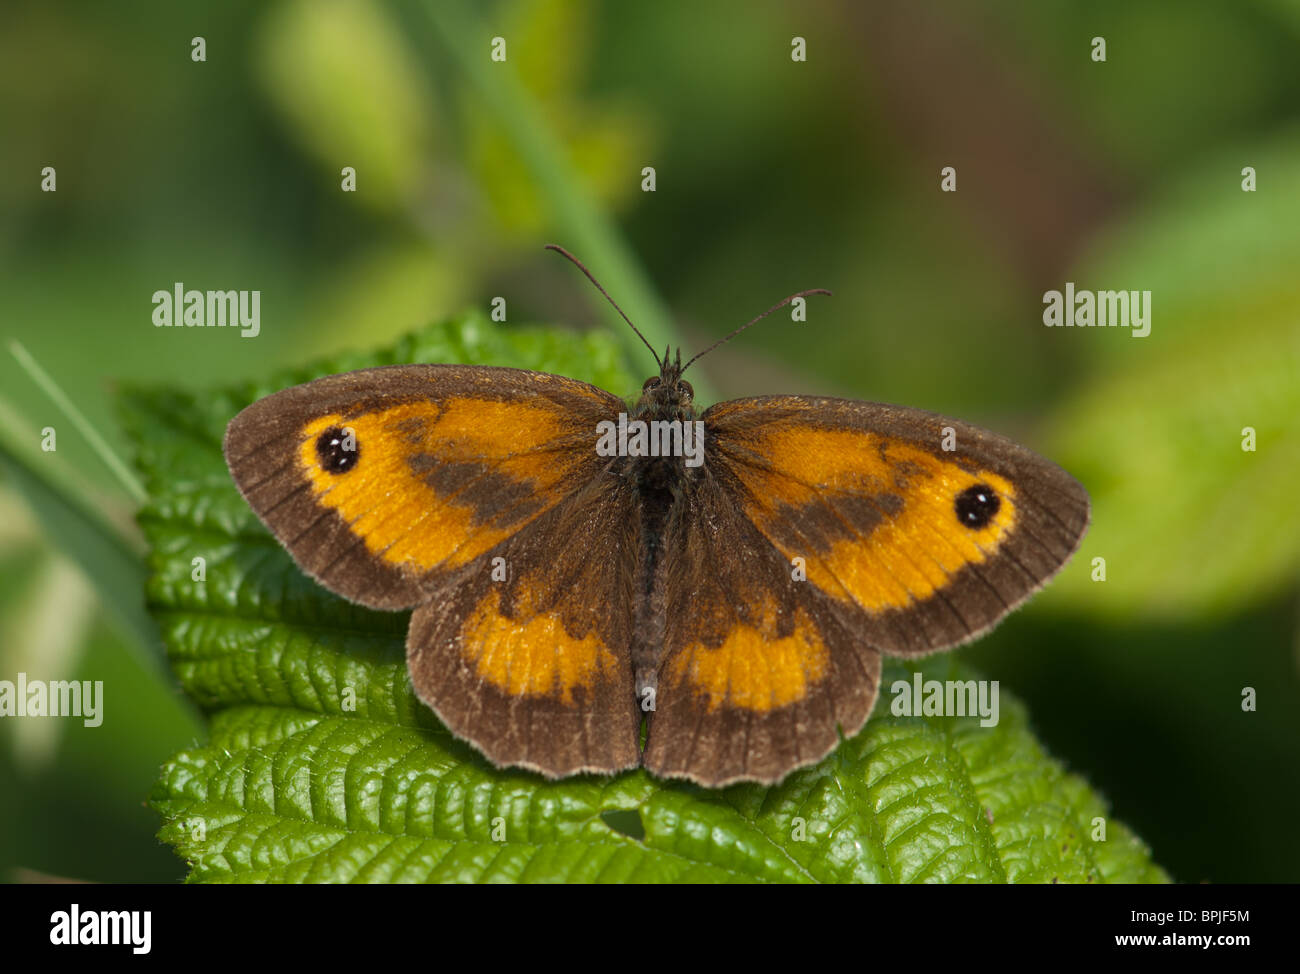 Gatekeeper Butterfly ruht auf einem Blatt Stockbild